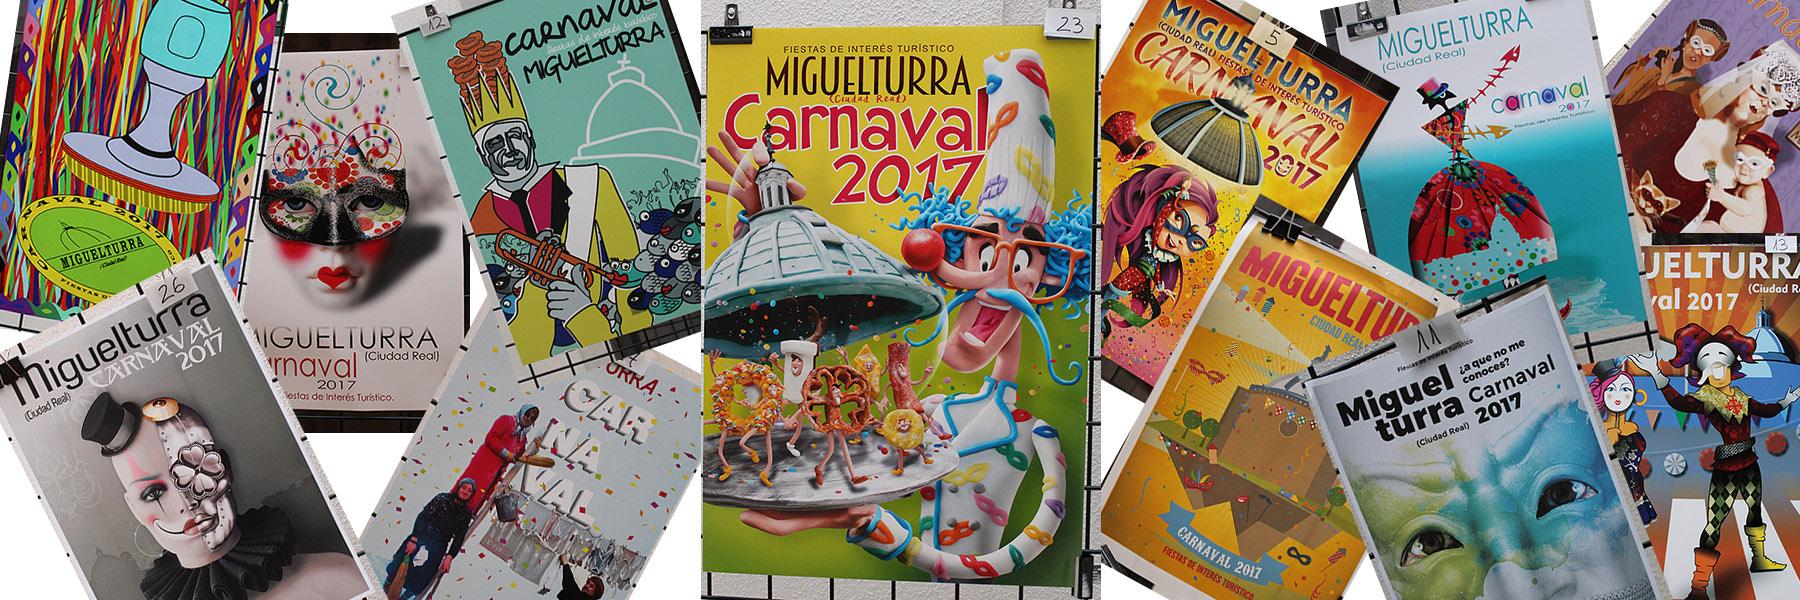 carnaval-miguelturra-concurso-carteles